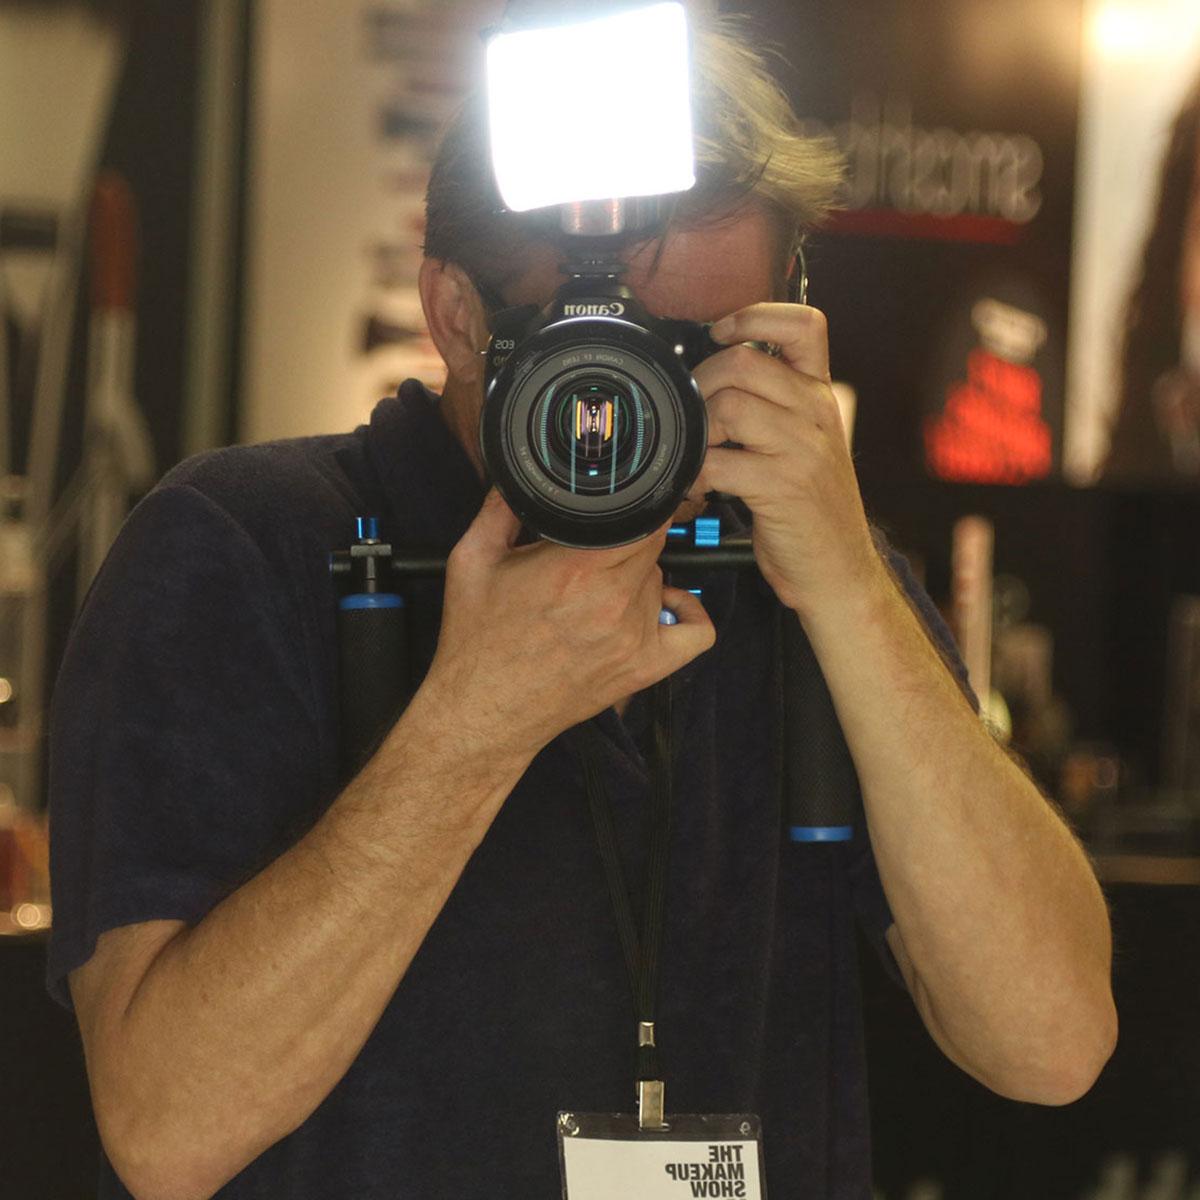 Web Designer and Photographer Matt Ordeshook